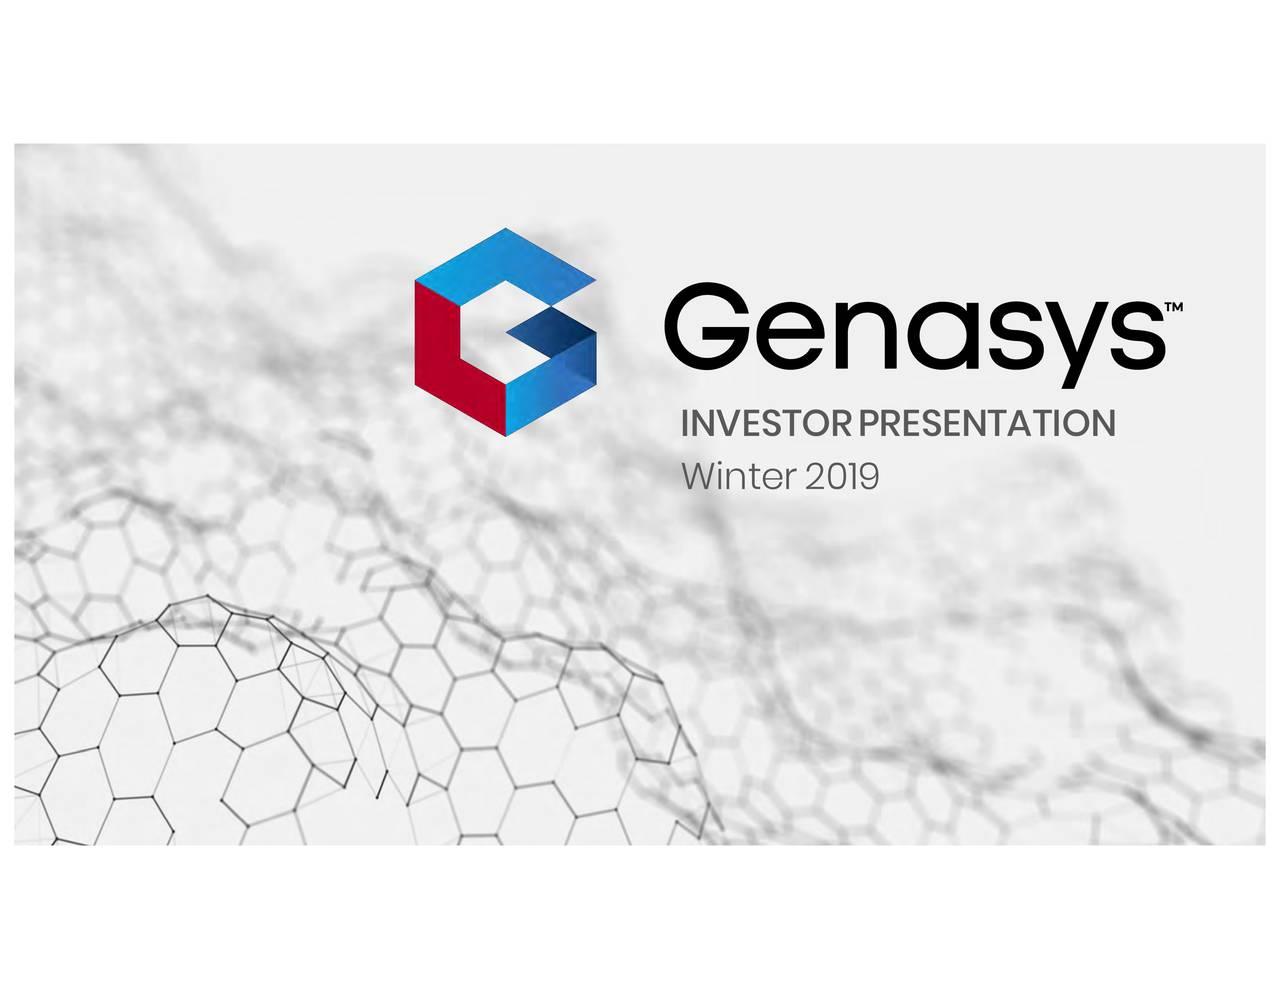 Genasys (GNSS) Presents At LD Micro Main Event - Slideshow - LRAD Corporation (NASDAQ:GNSS) | Seeking Alpha